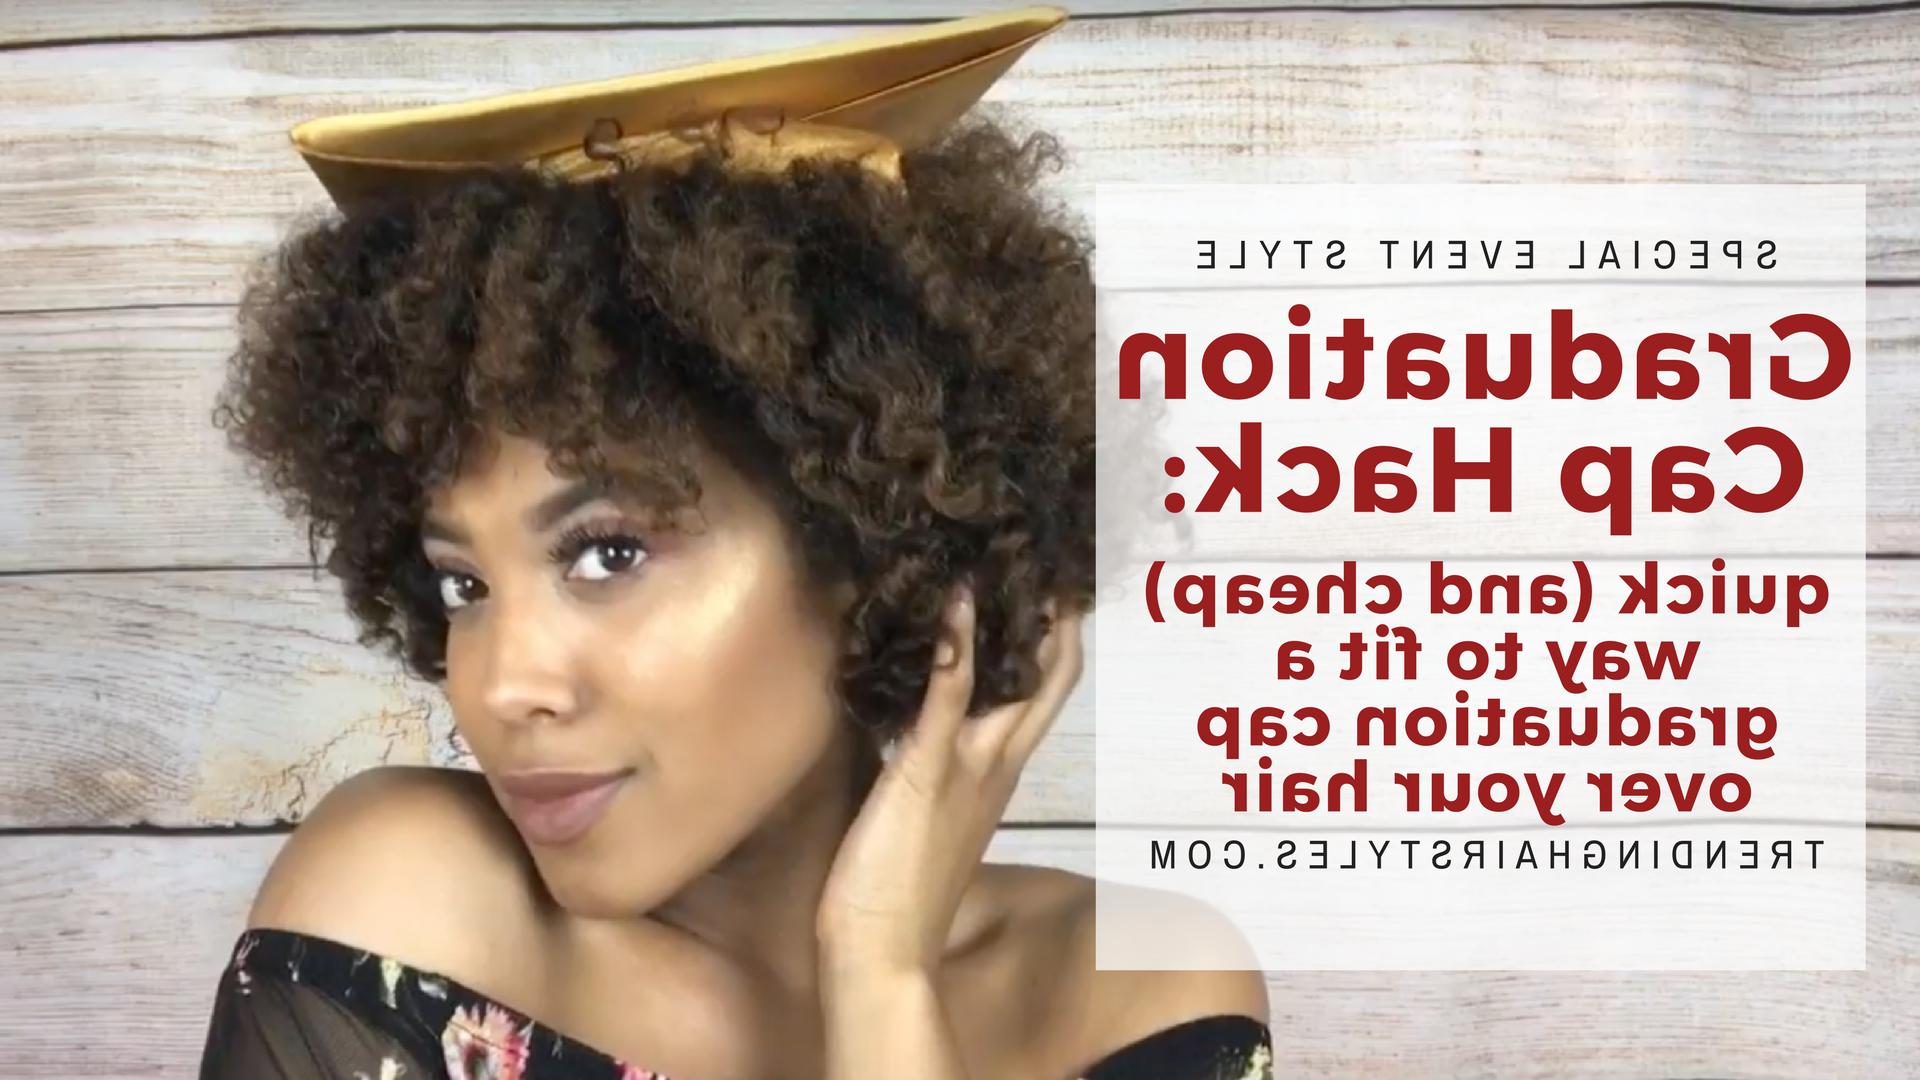 Graduation Cap Hack: How To Fit A Graduation Cap Over Your Hair throughout Short Hair Graduation Cap